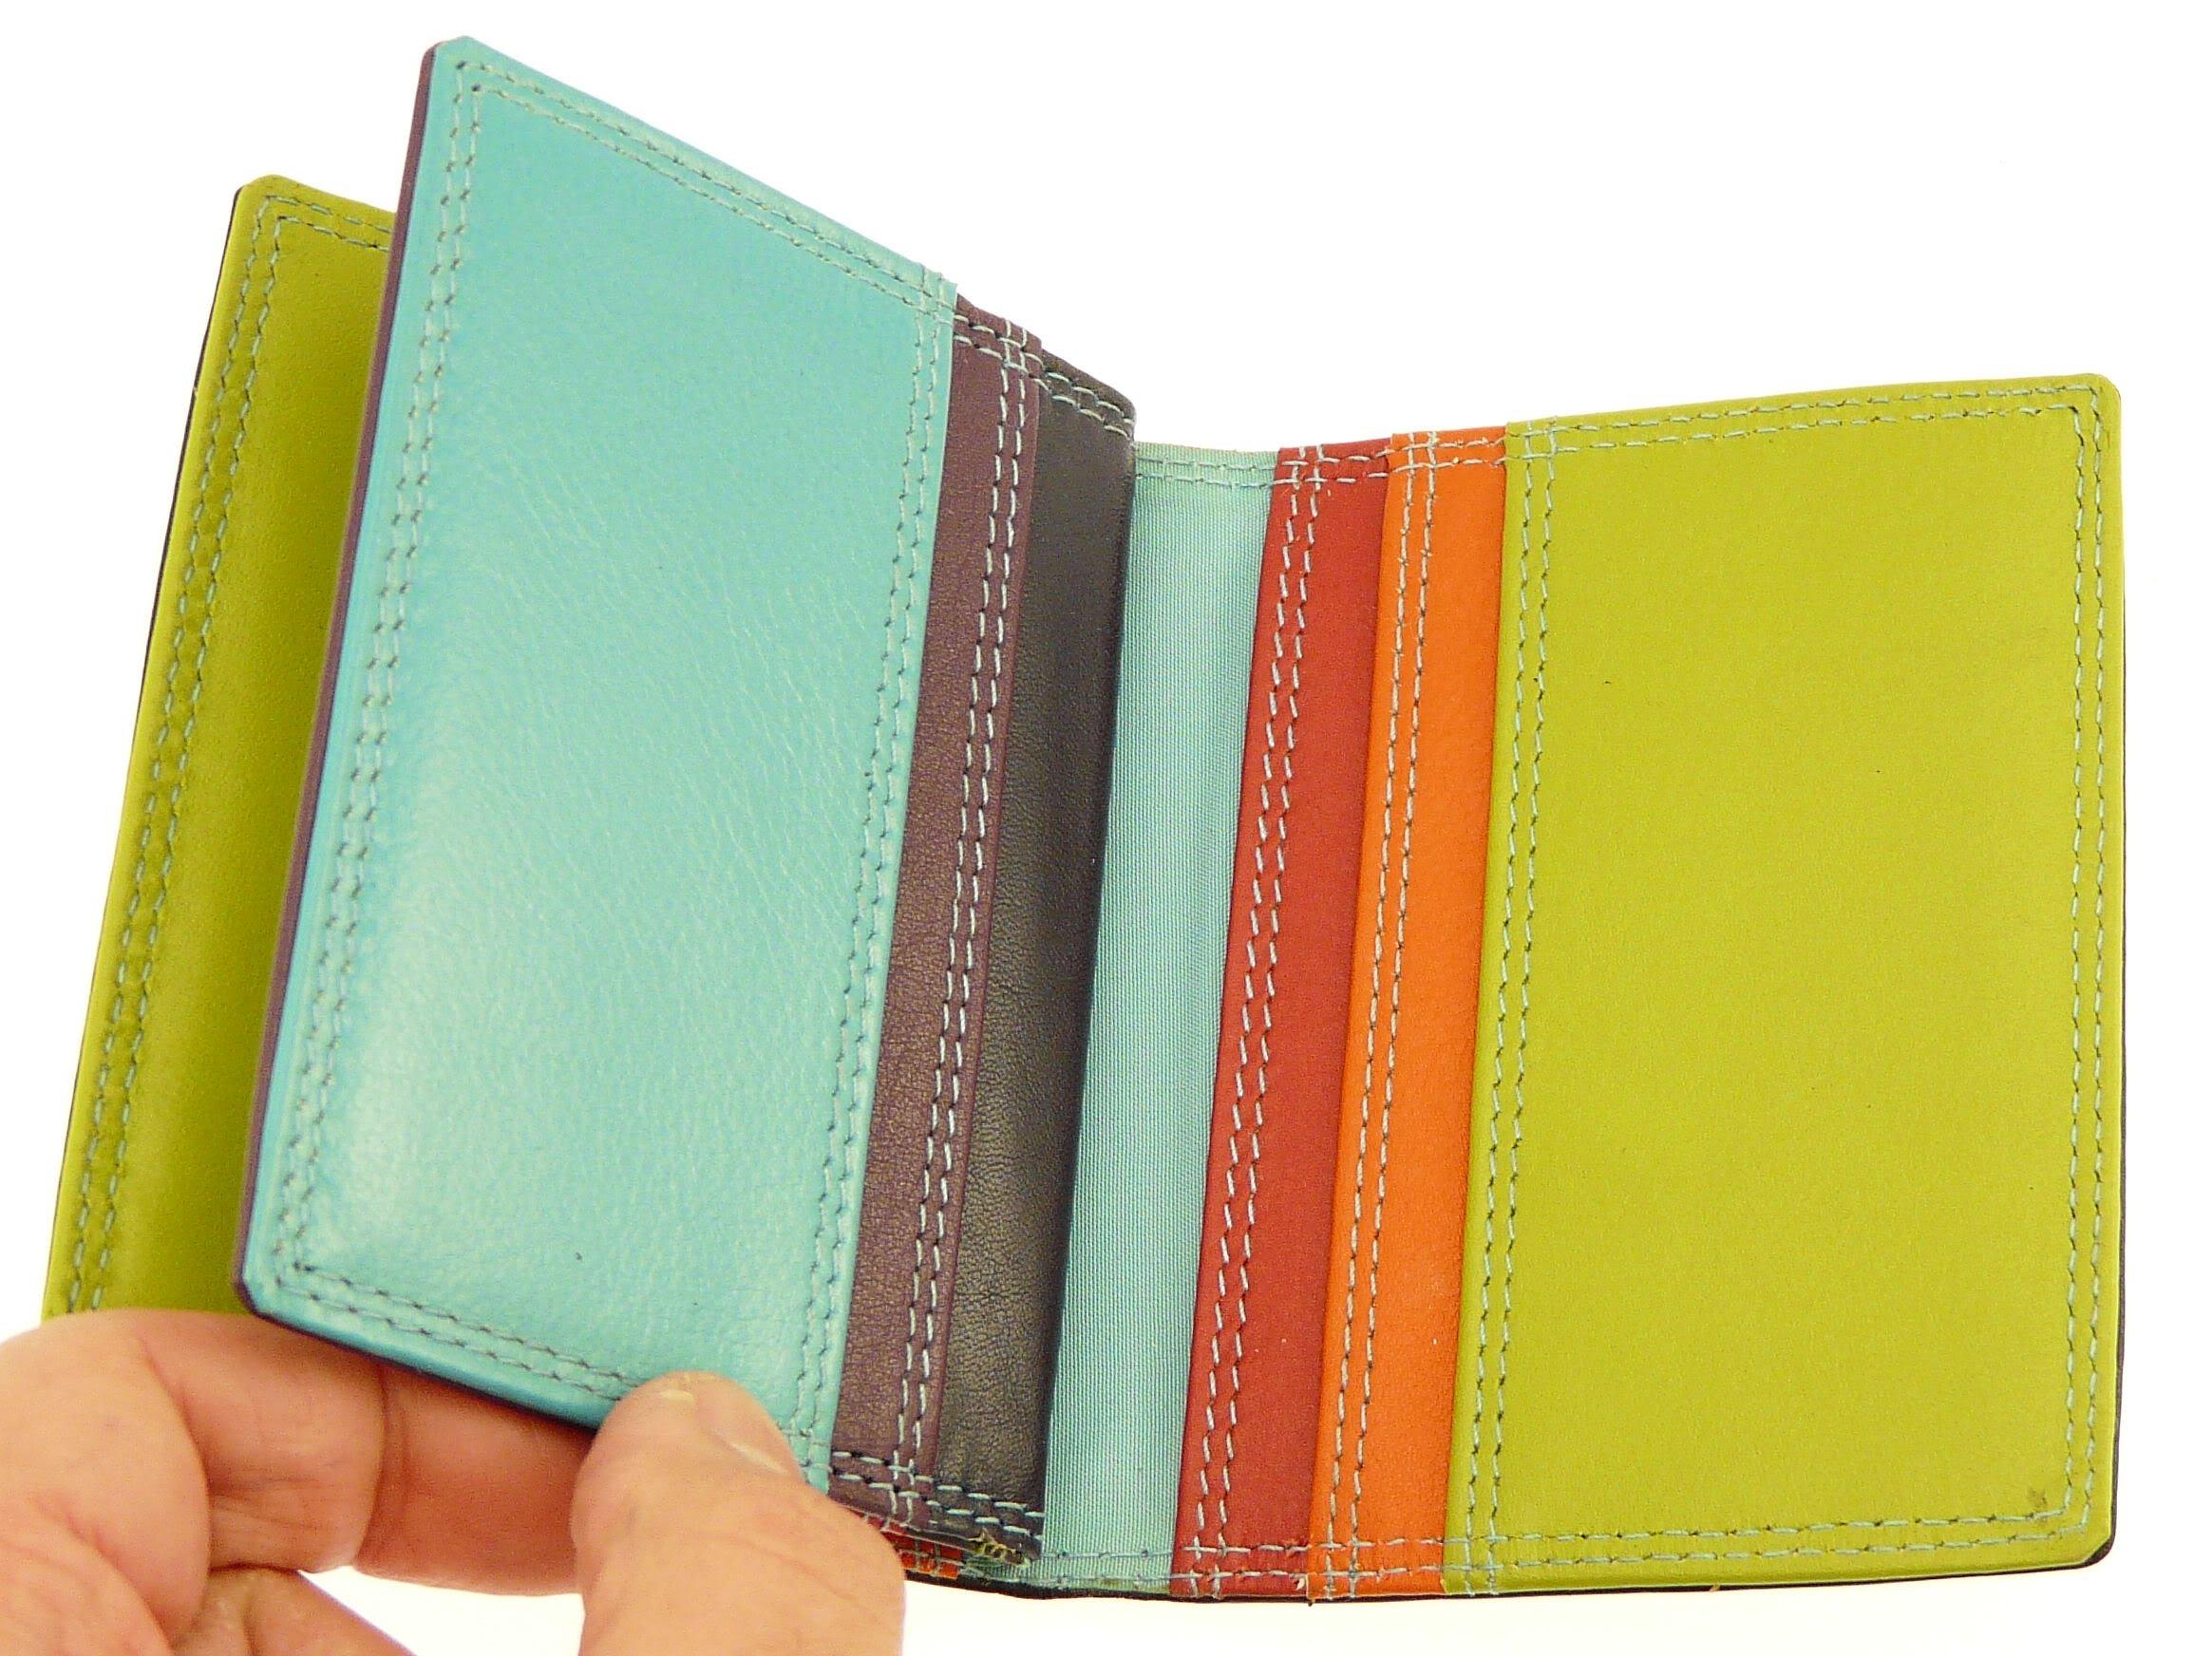 Black & Multi-color Leather Credit Card Holder / Wallet - Holds 10 Credit Cards by Neptune Giftware (Image #6)